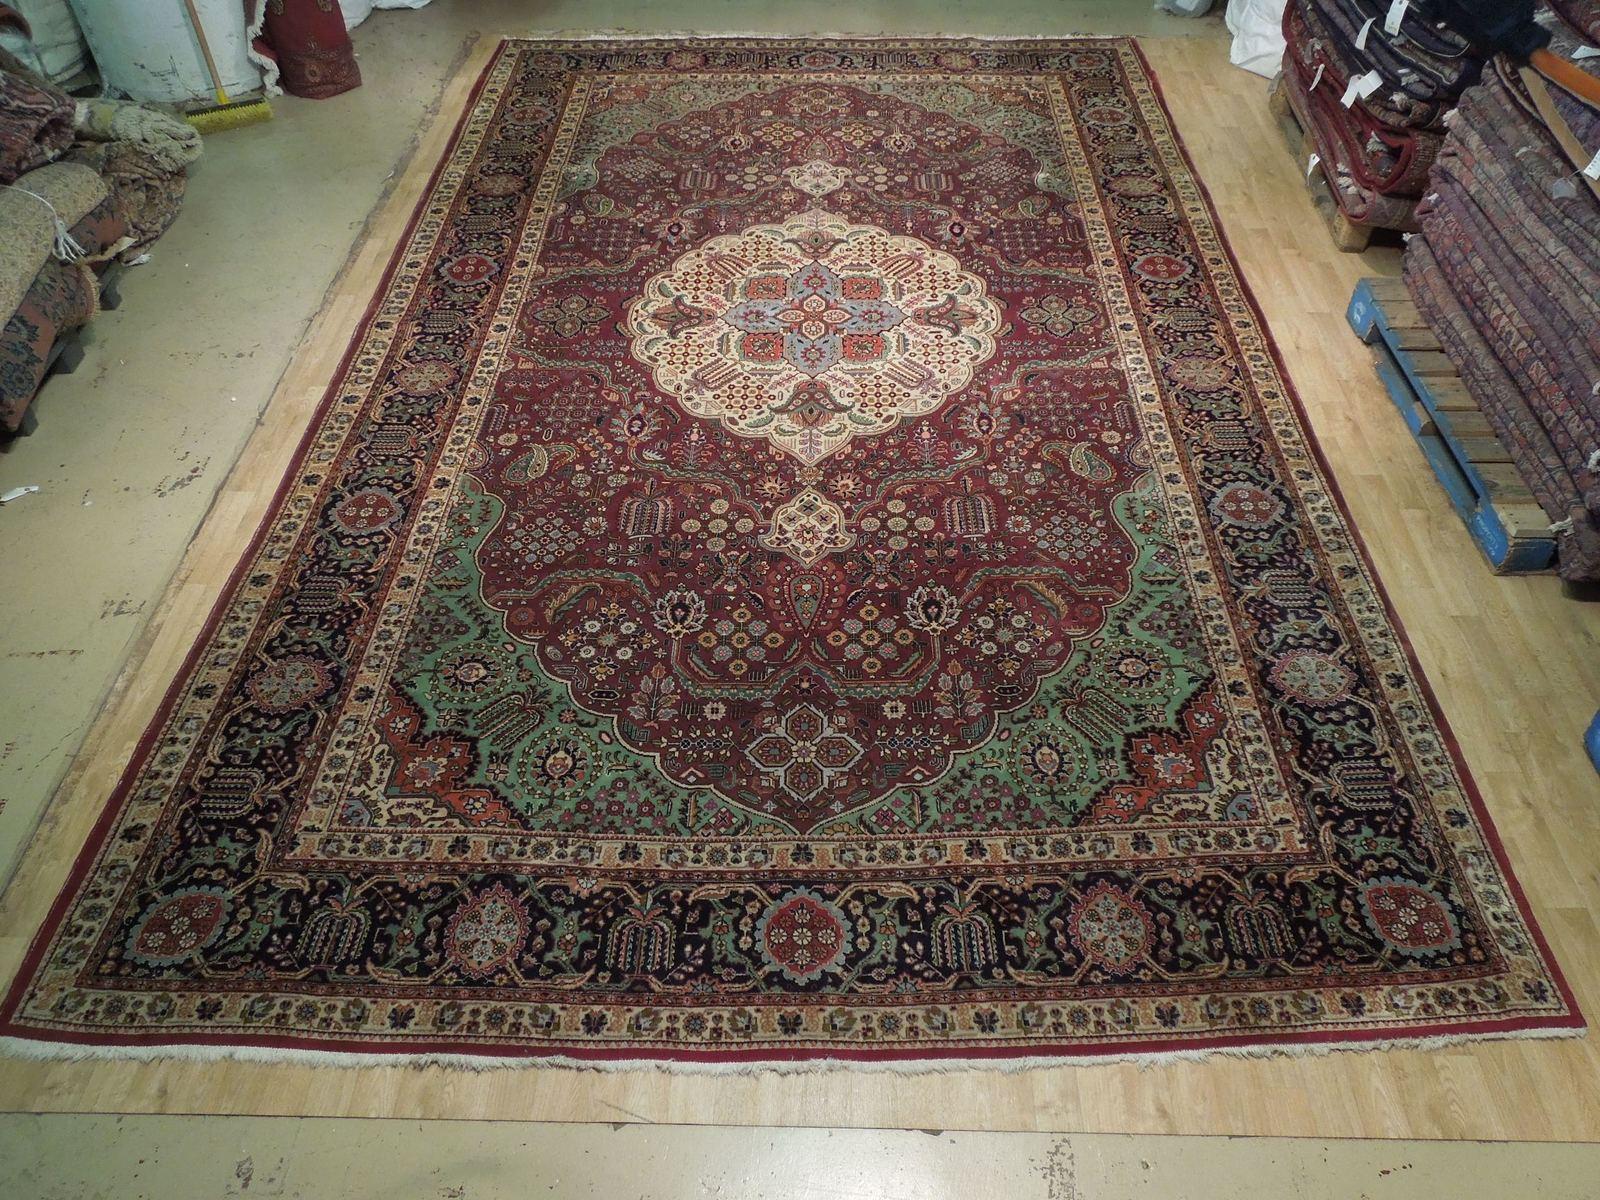 Compex Design Original Red Traditional Persian Wool Handmade Rug 10x16 Rug image 4